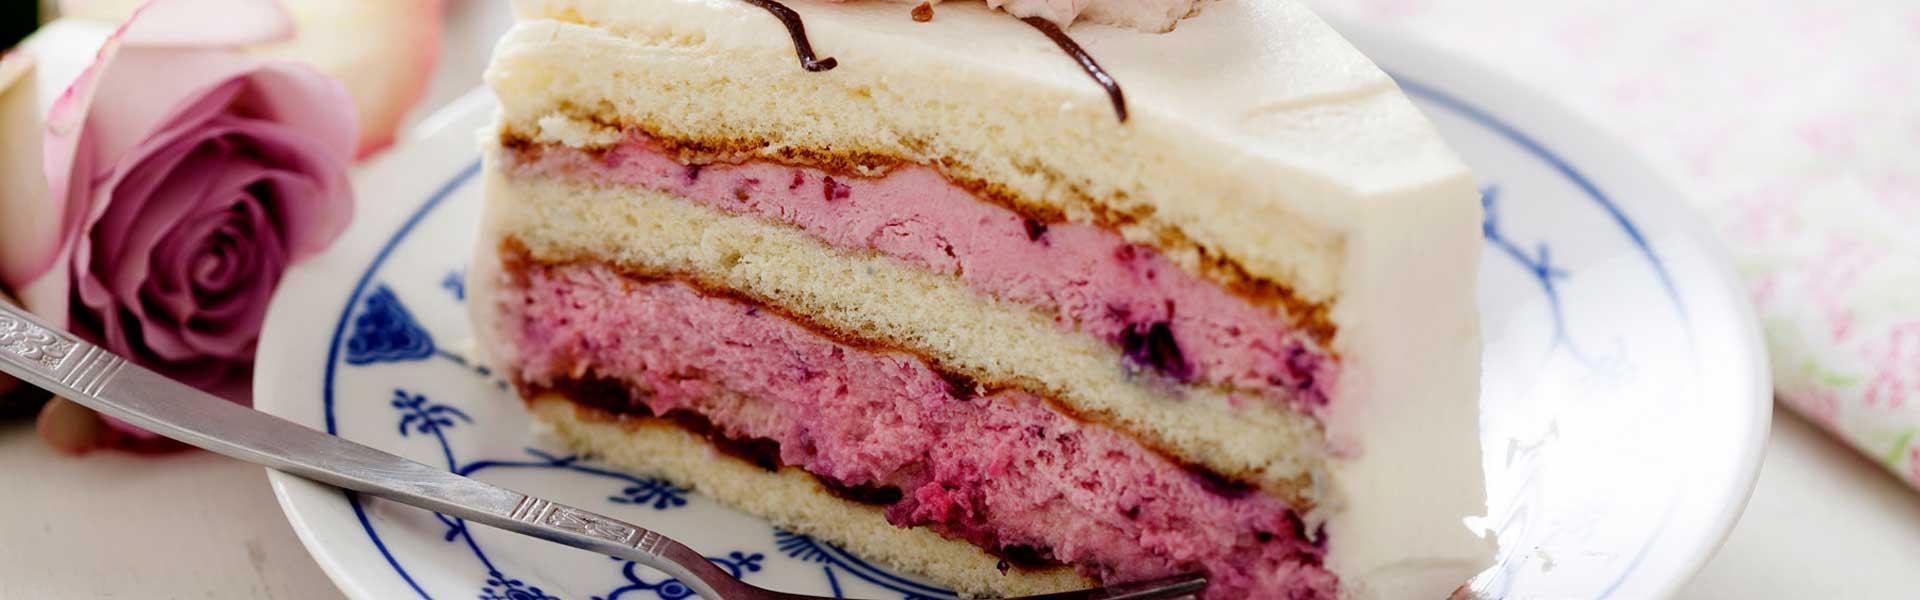 Slice of Wedding Cake